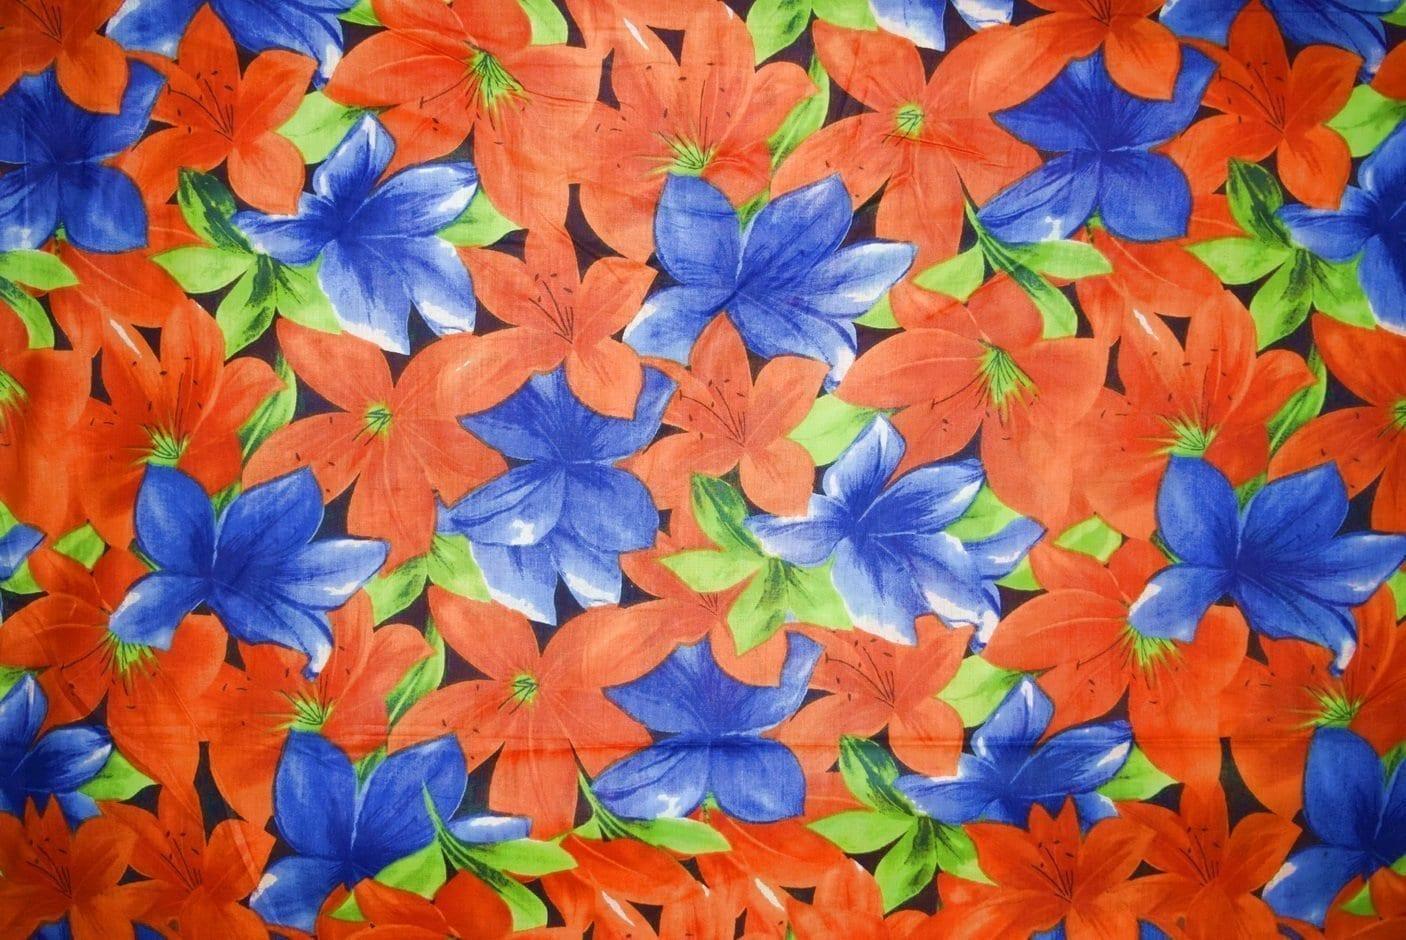 100% PURE Soft COTTON PRINTED fabric PC255 2